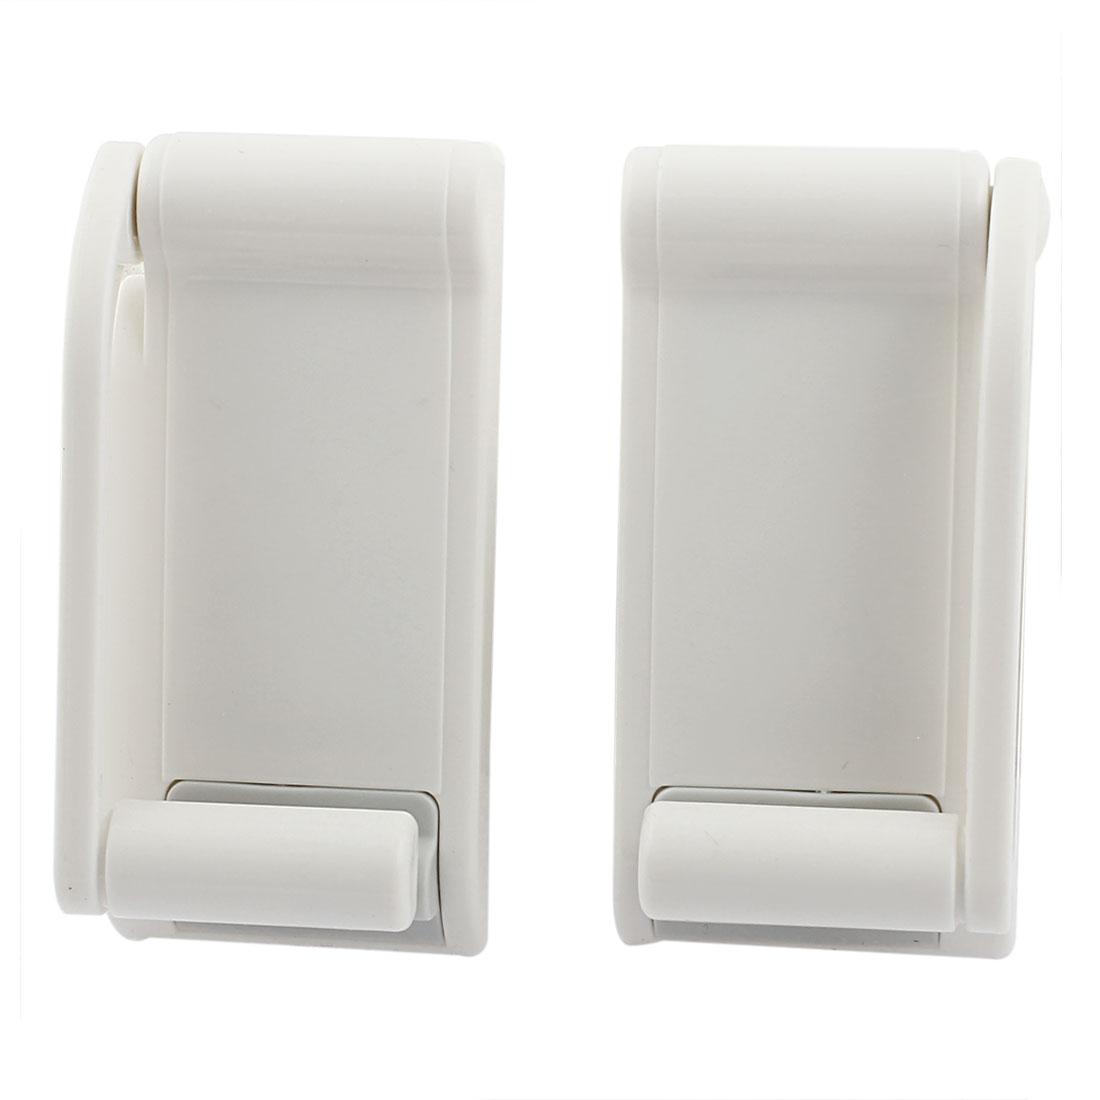 Plastic Adjustable Magnet Kitchen Bathroom Paper Tissue Holder Bracket Off White